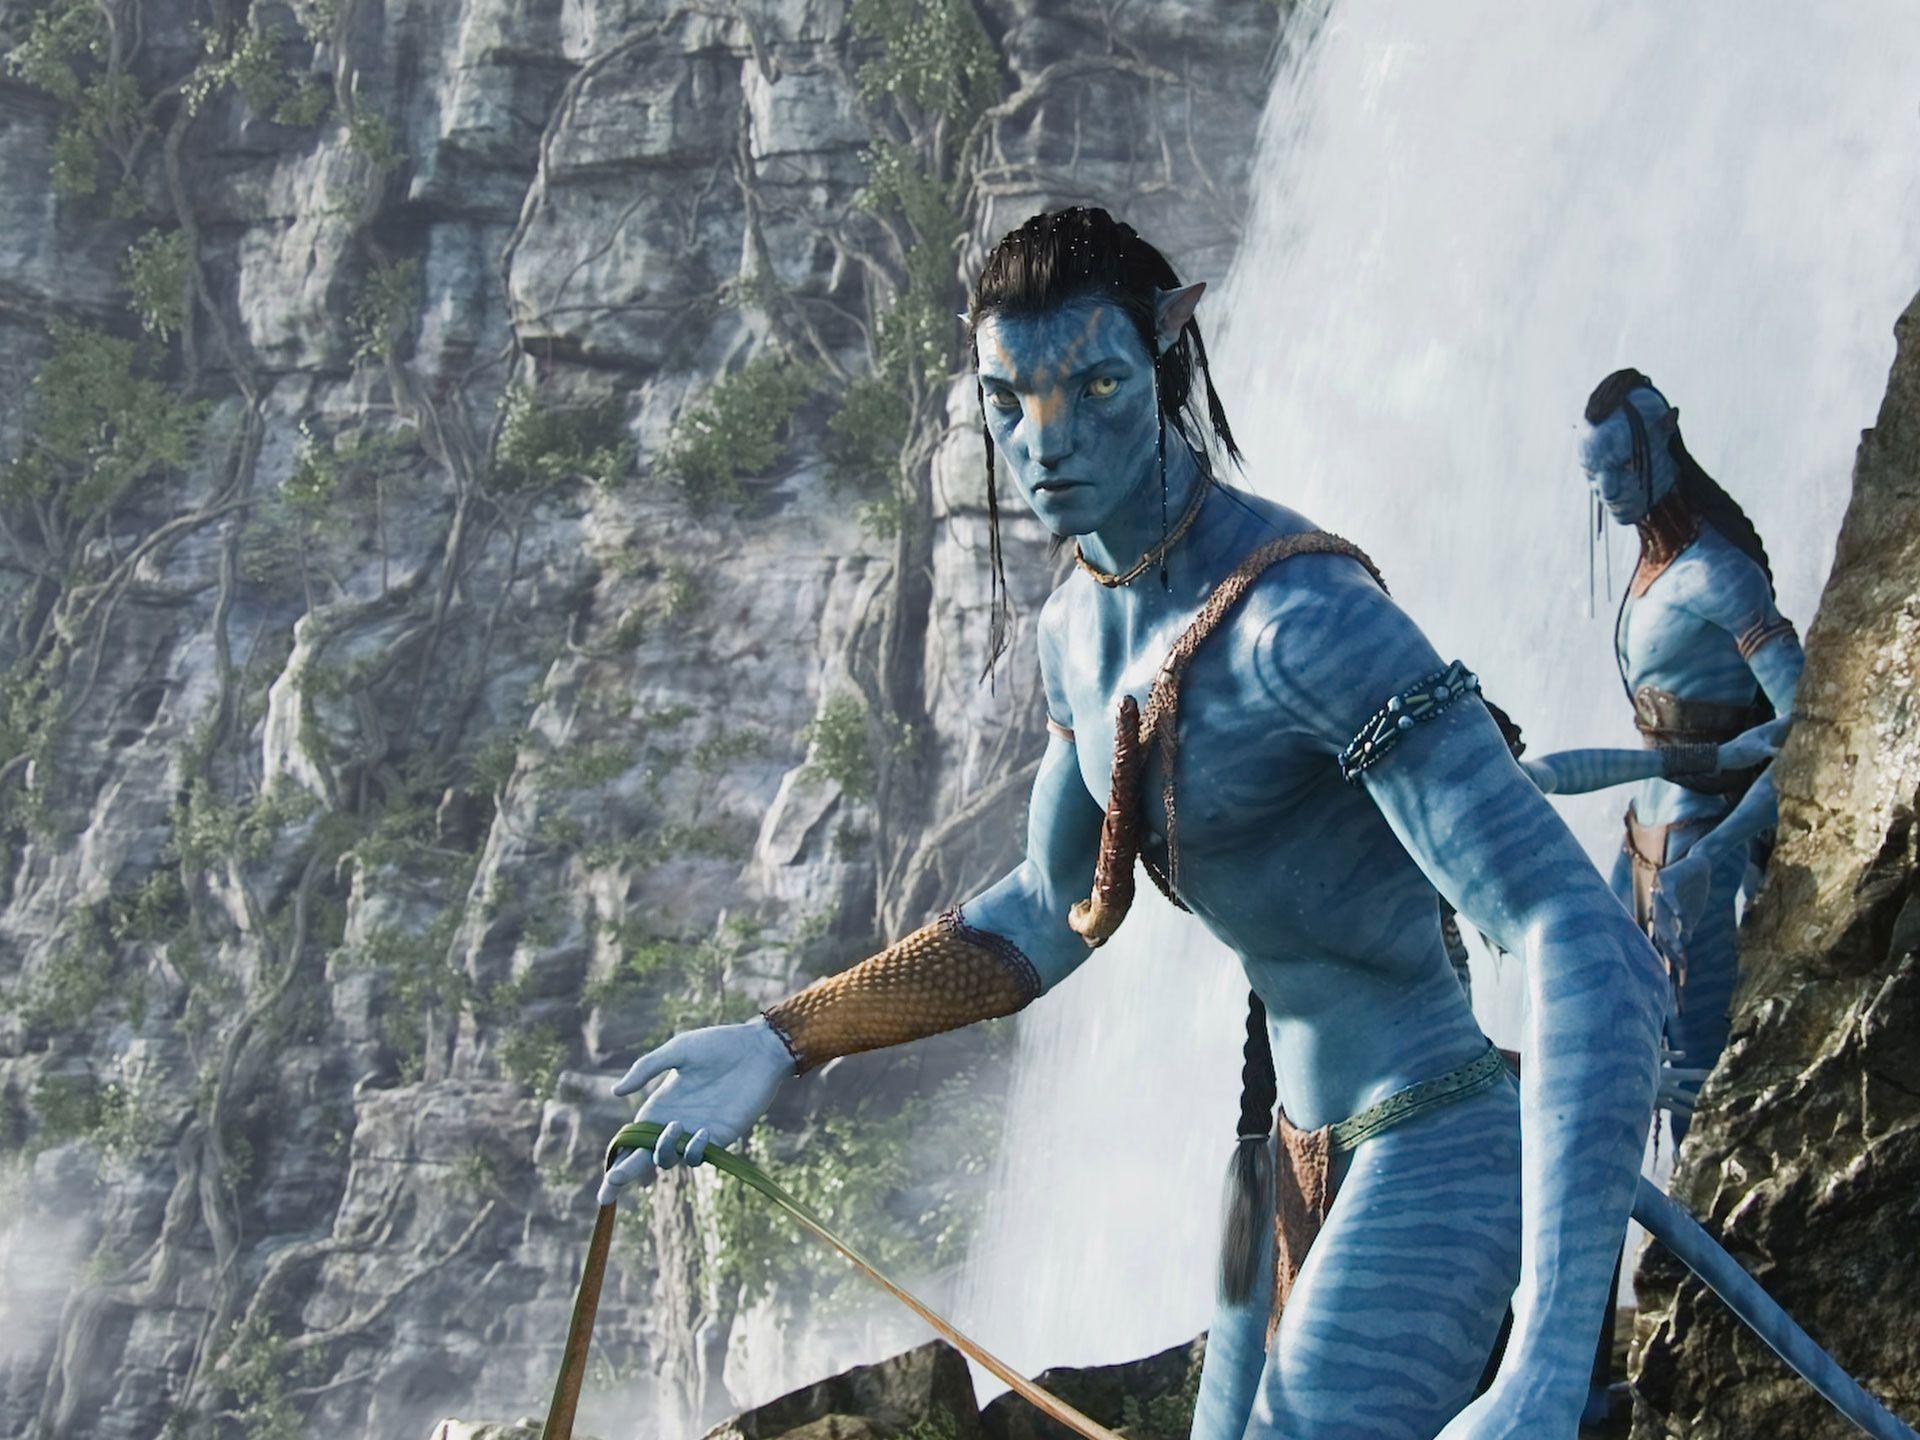 avatar movie wallpaper - jake sully 1920x1440 | avatar | pinterest